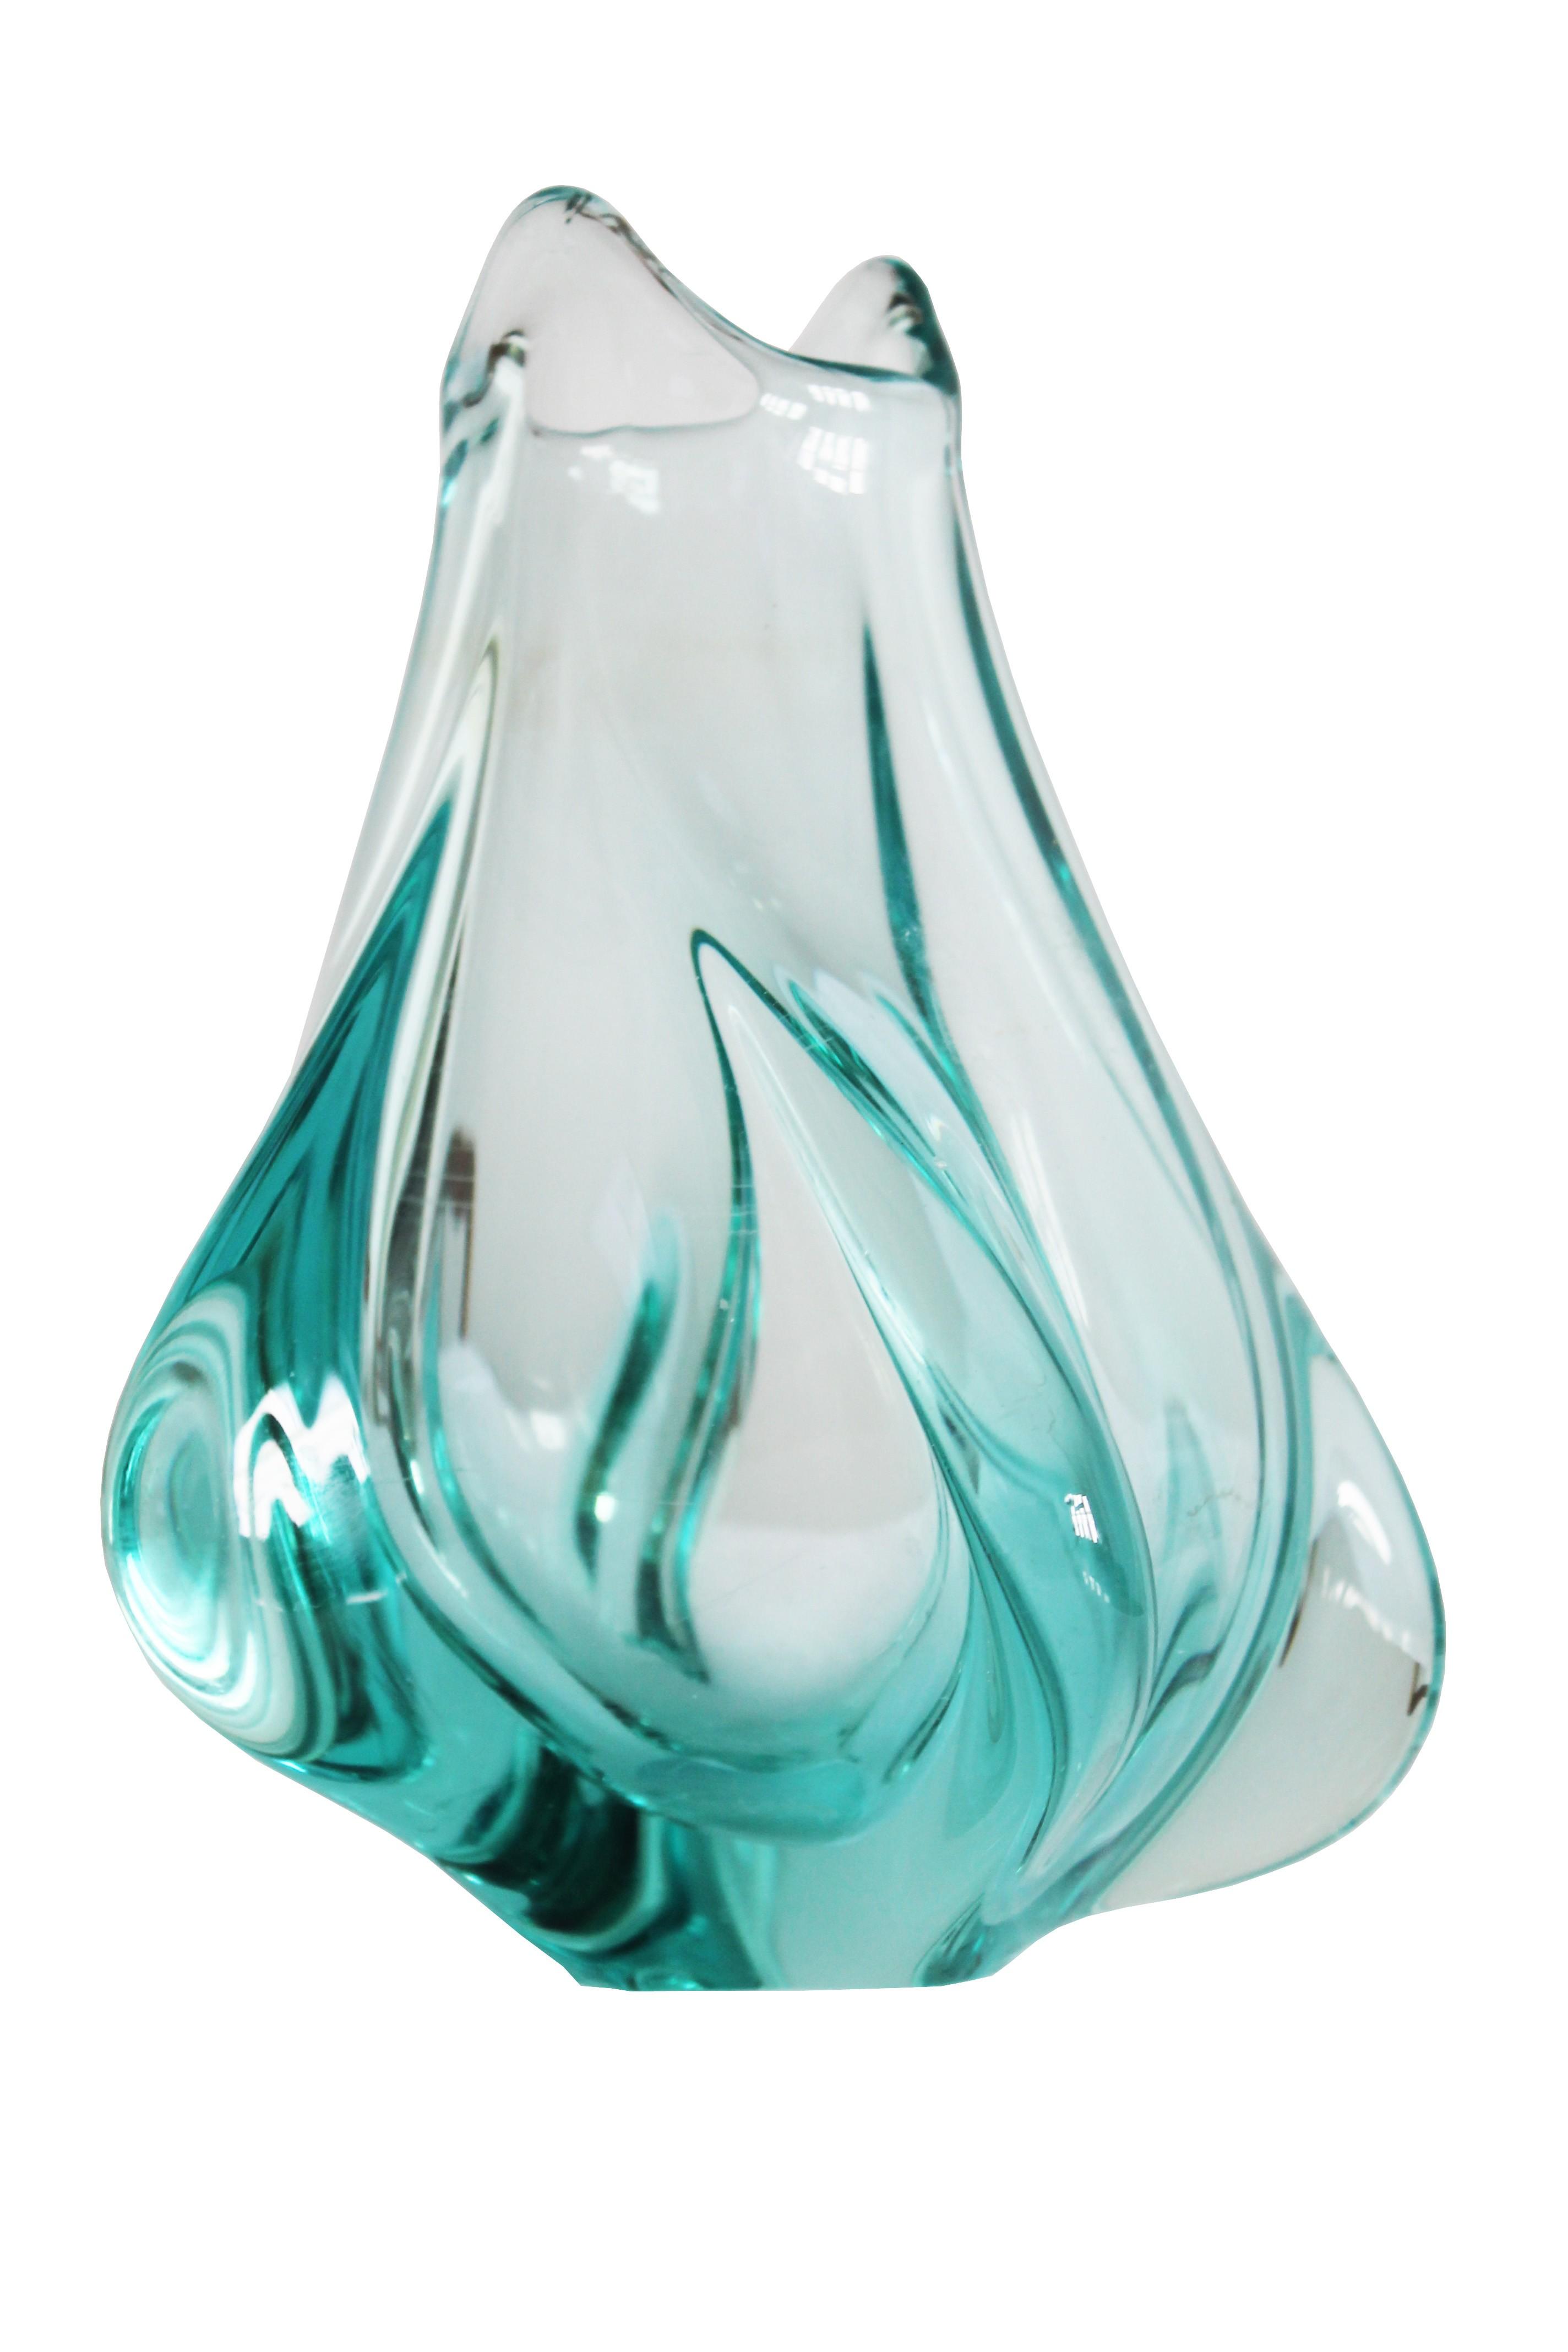 Vintage blown glass flower vase by miloslav klinger 1950s previous next reviewsmspy